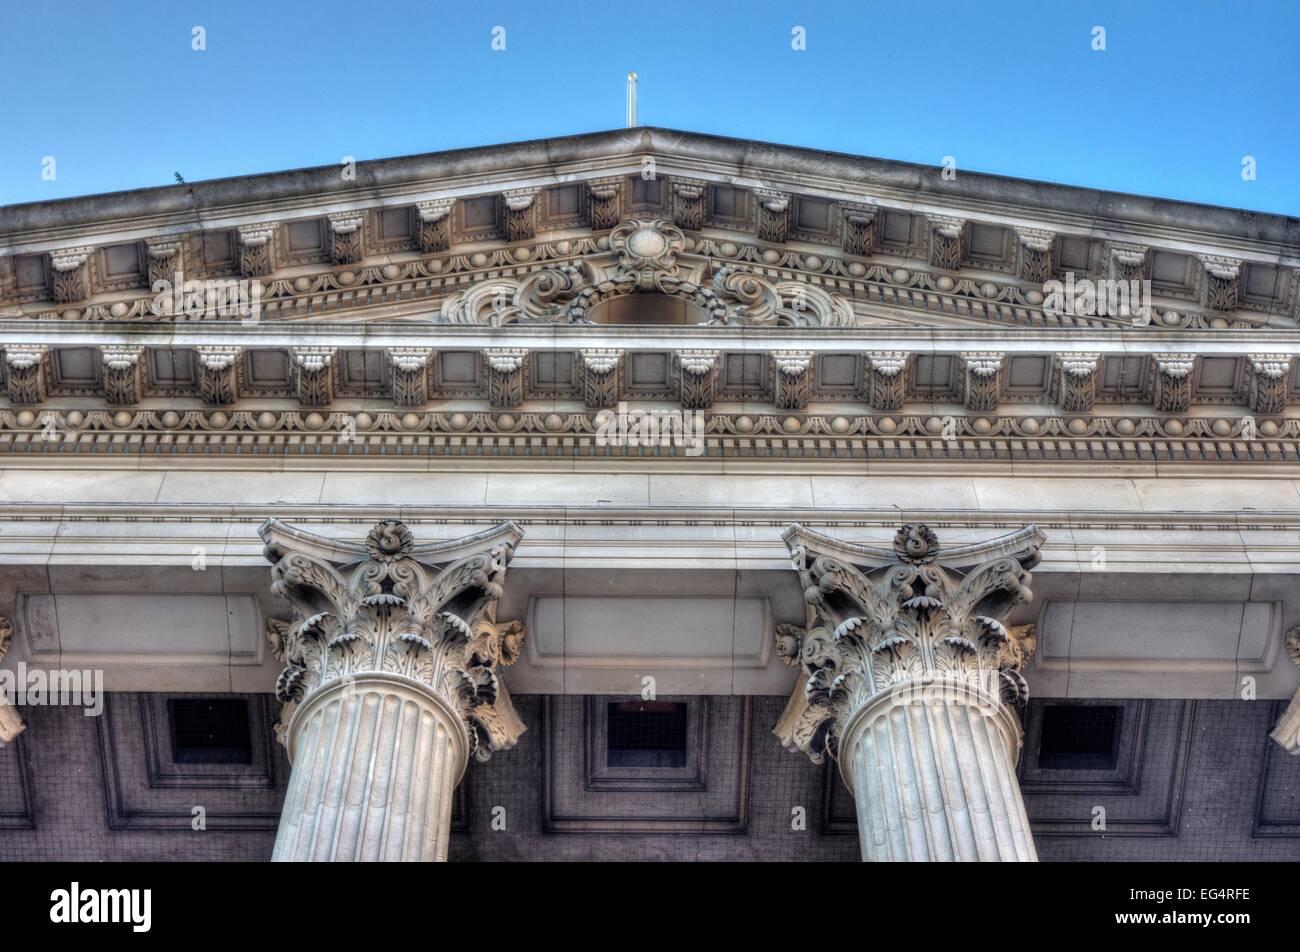 corinthian columns and pediment - Stock Image